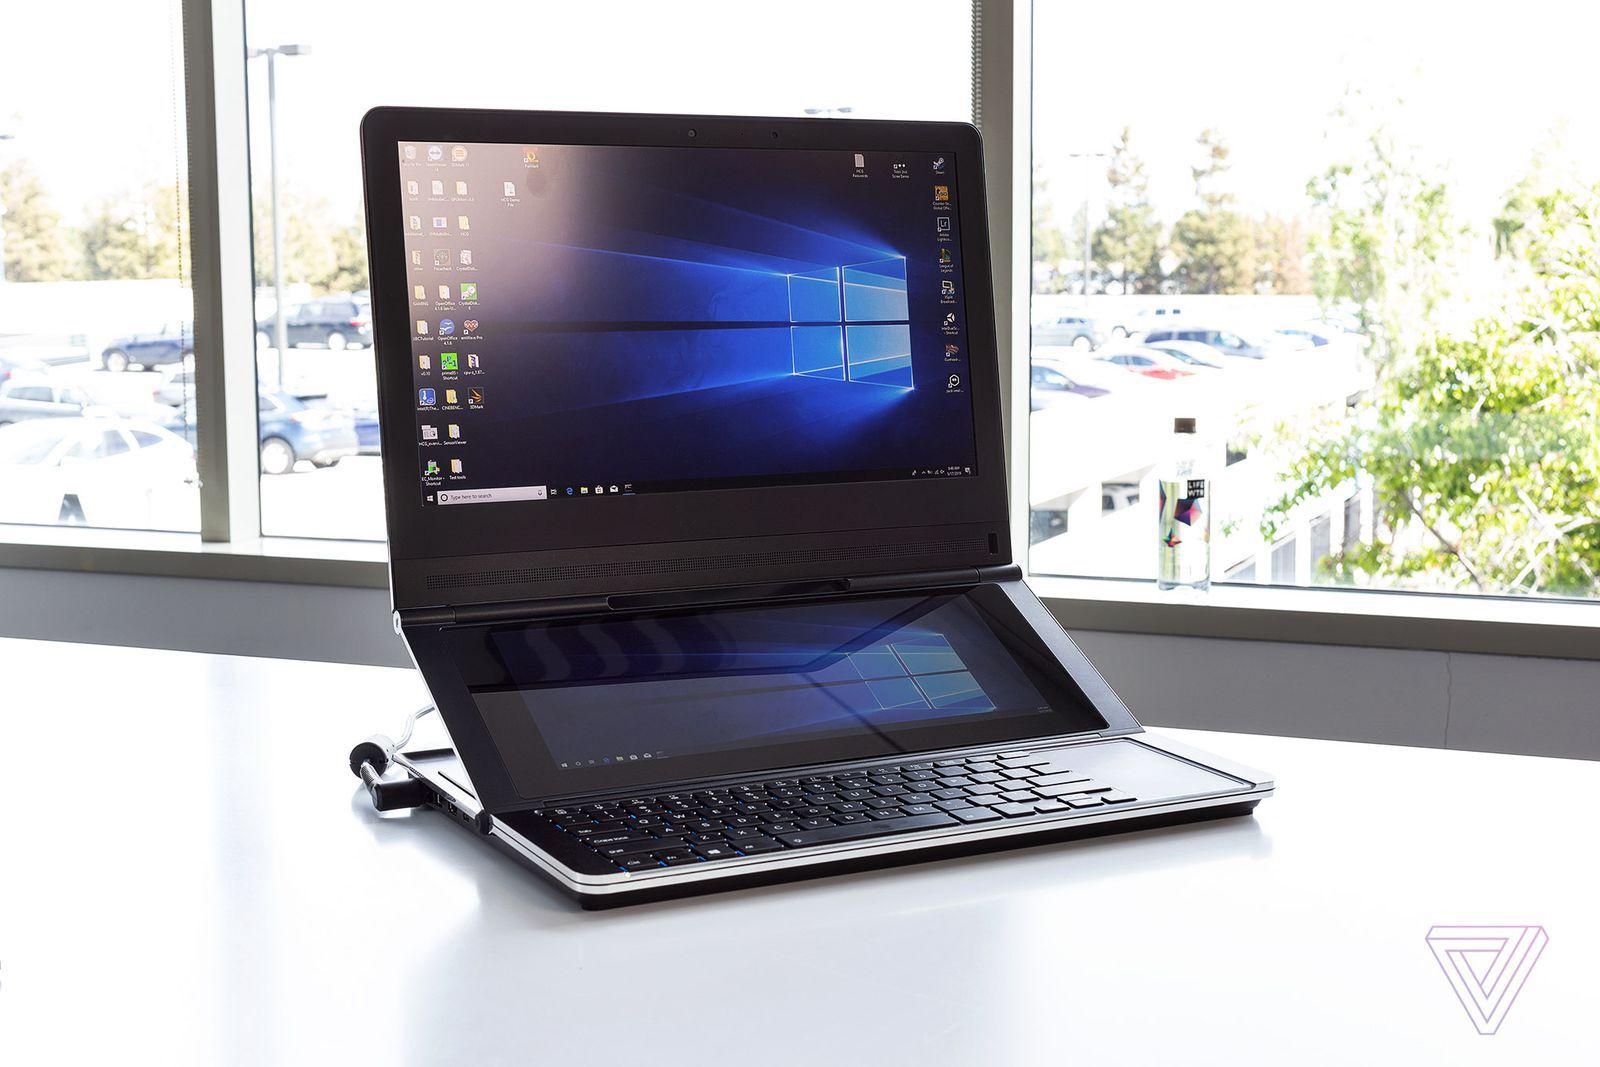 Intel sogna un notebook con display secondario richiudibile a cerniera